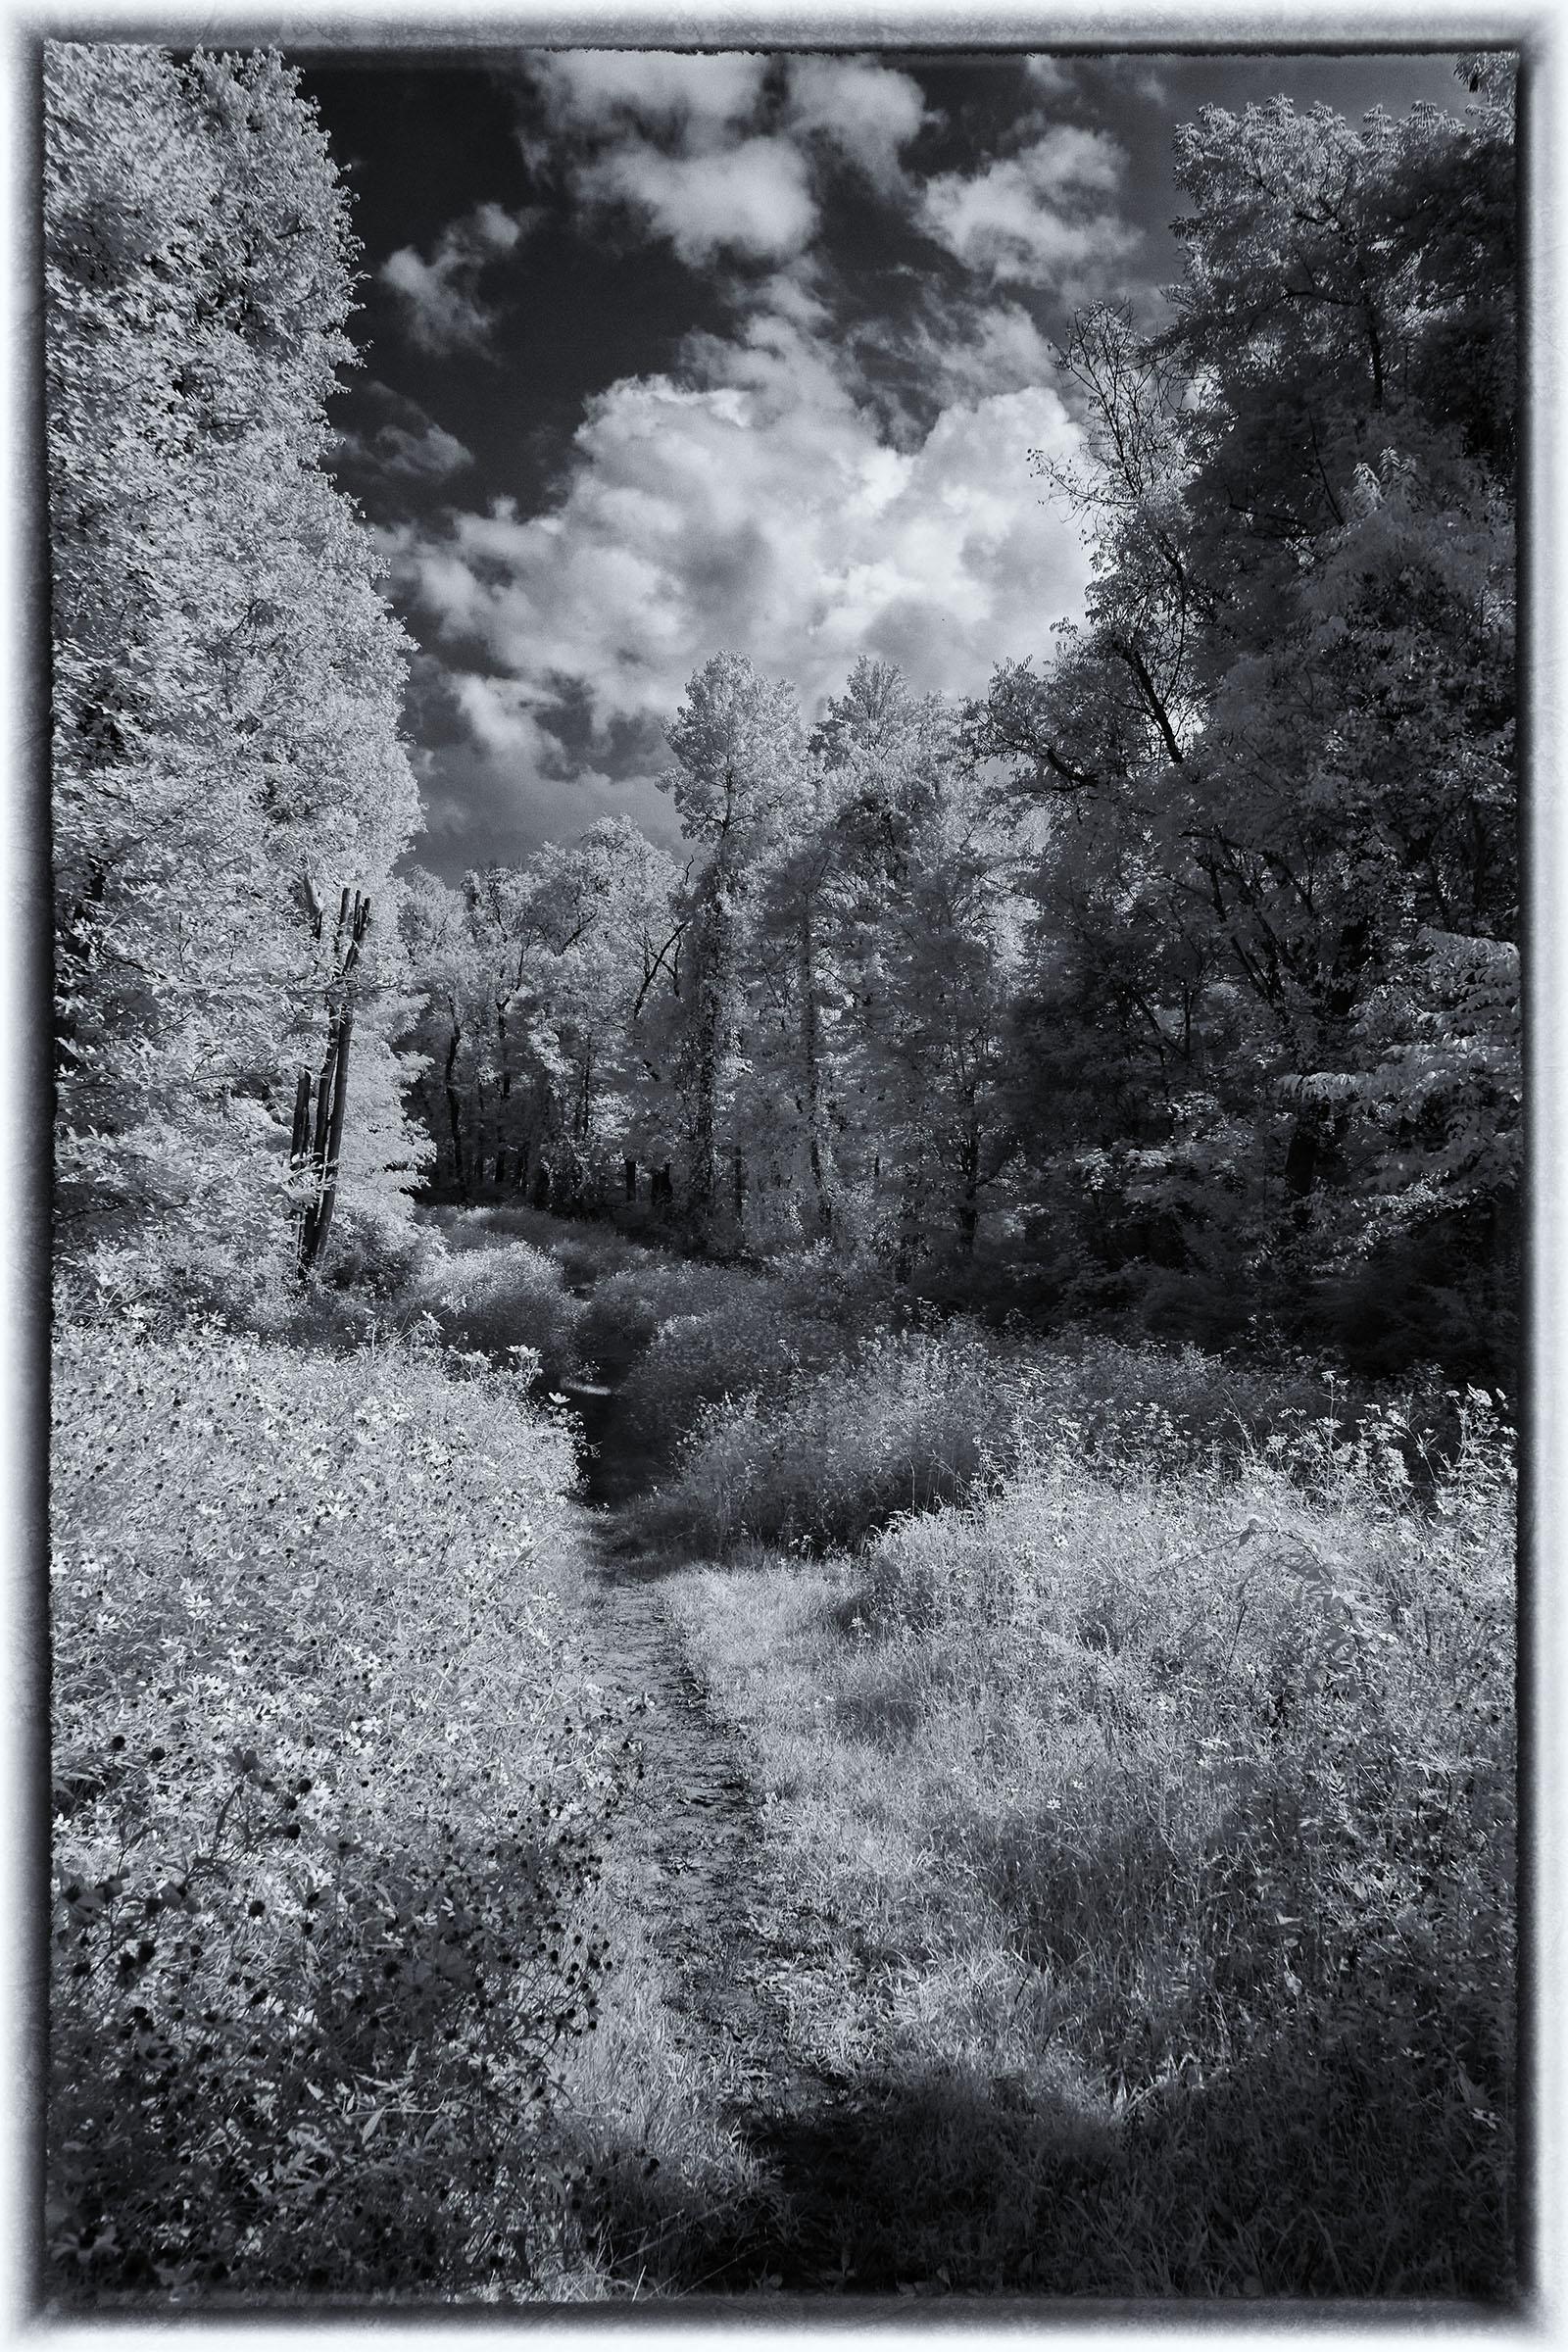 greyscale infared photograph